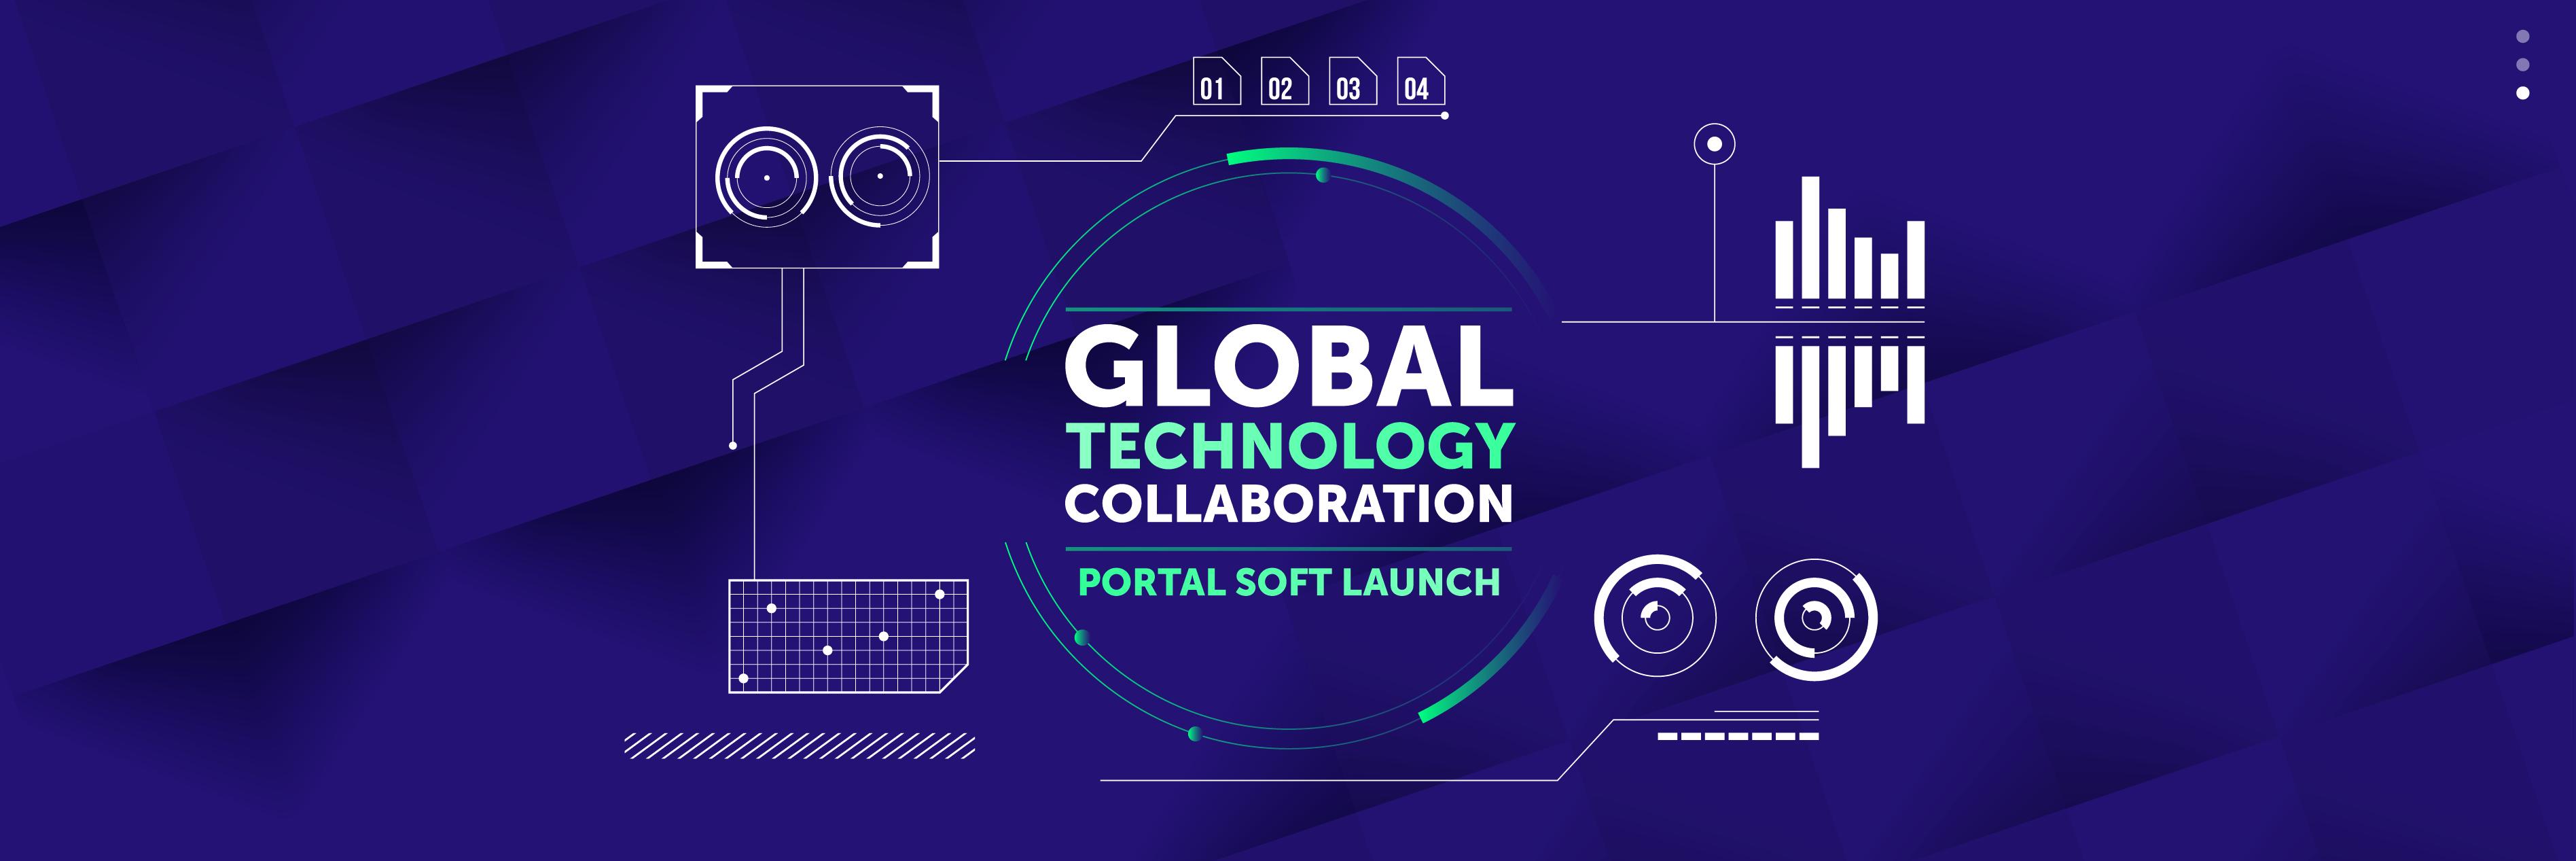 GTC Portal Web Banner.jpg